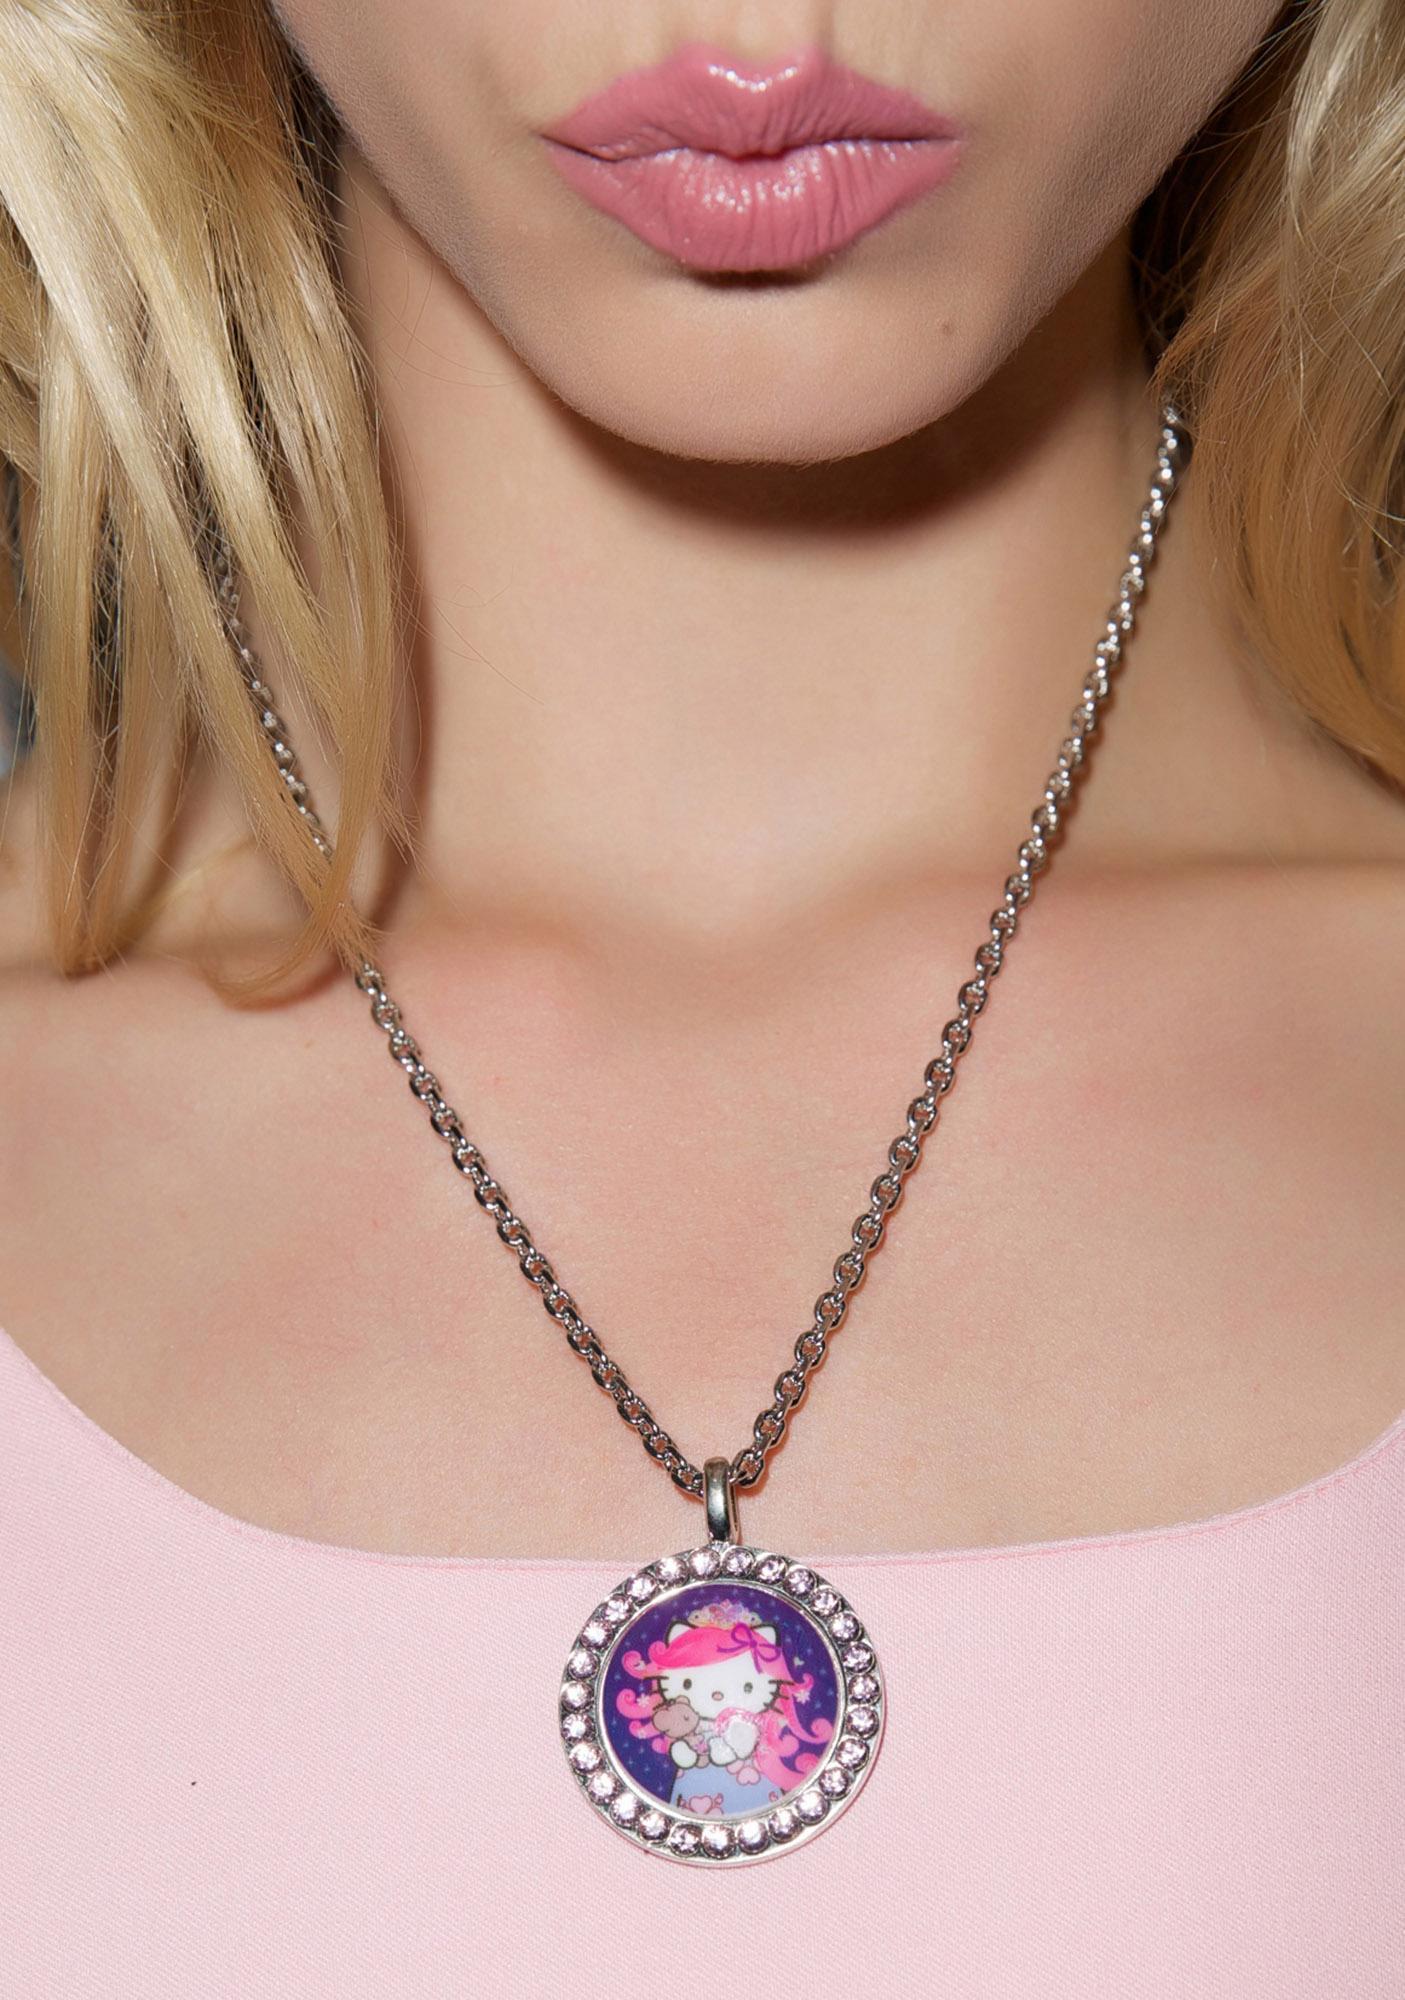 Tarina Tarantino Crystal Persuasion Pendant Necklace